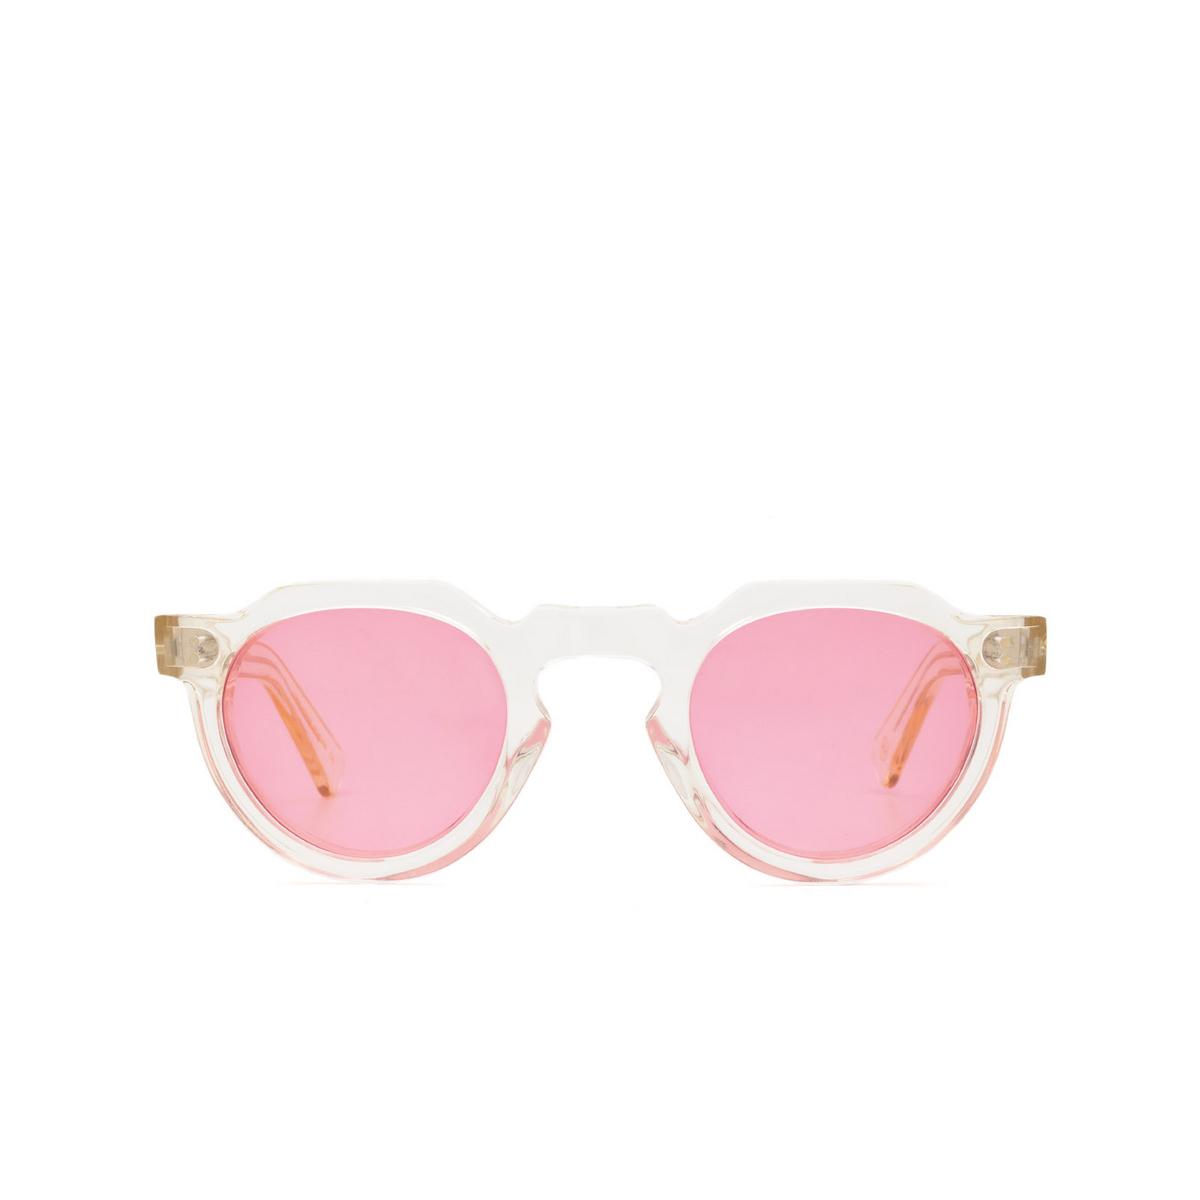 Lesca® Irregular Sunglasses: Crown Panto X Mia Burton color 21 - SELF-LOVING PINK - front view.